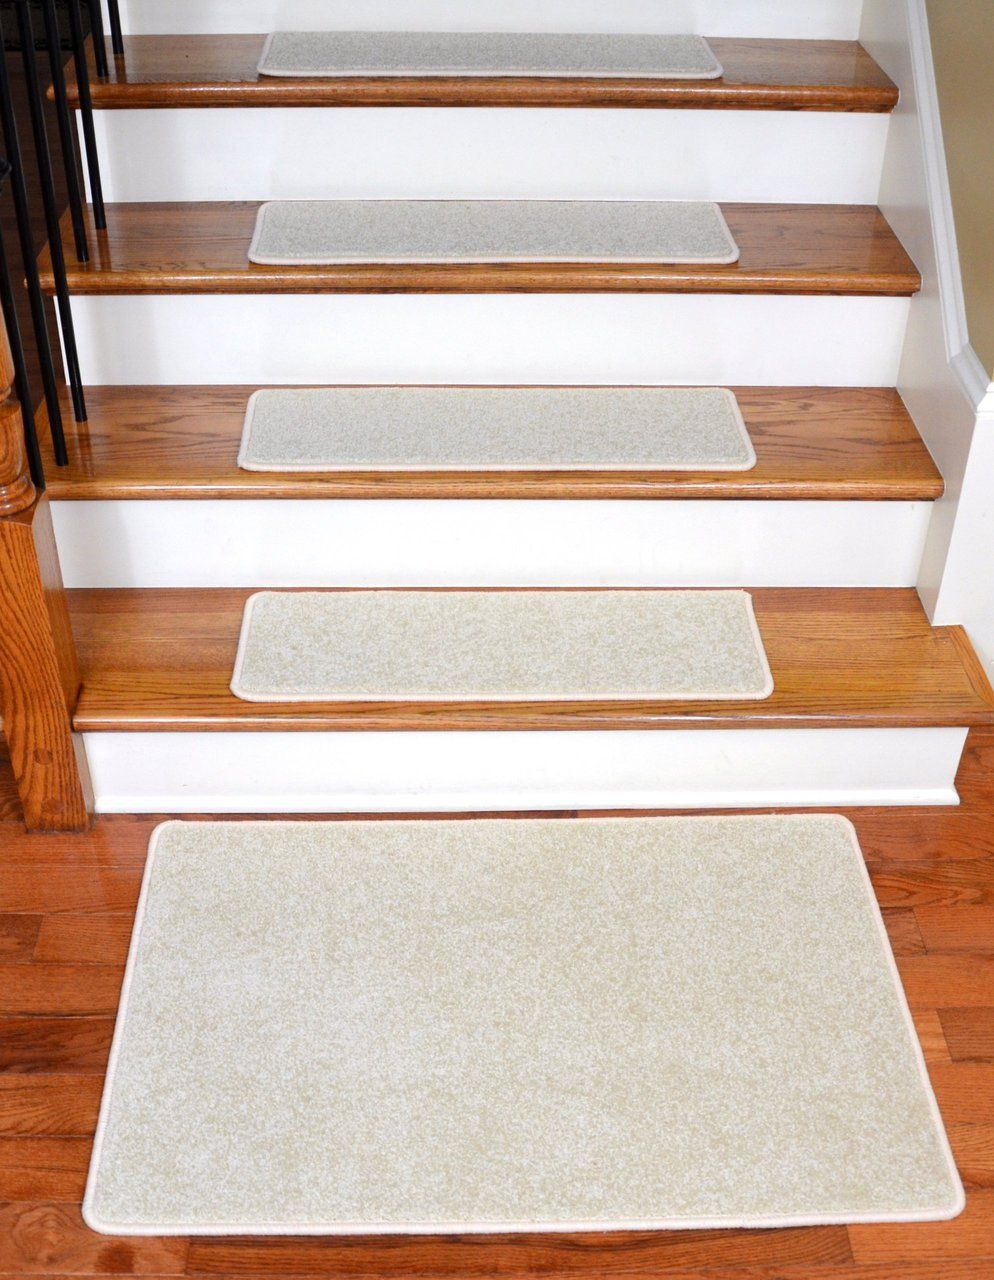 Navy Blue Dean Carpet Stair Treads 23 X 8 Set Of 13 Home   Navy Blue Stair Treads   Wayfair   Non Slip   Longshore Tides   Rug Stair   Stair Runners